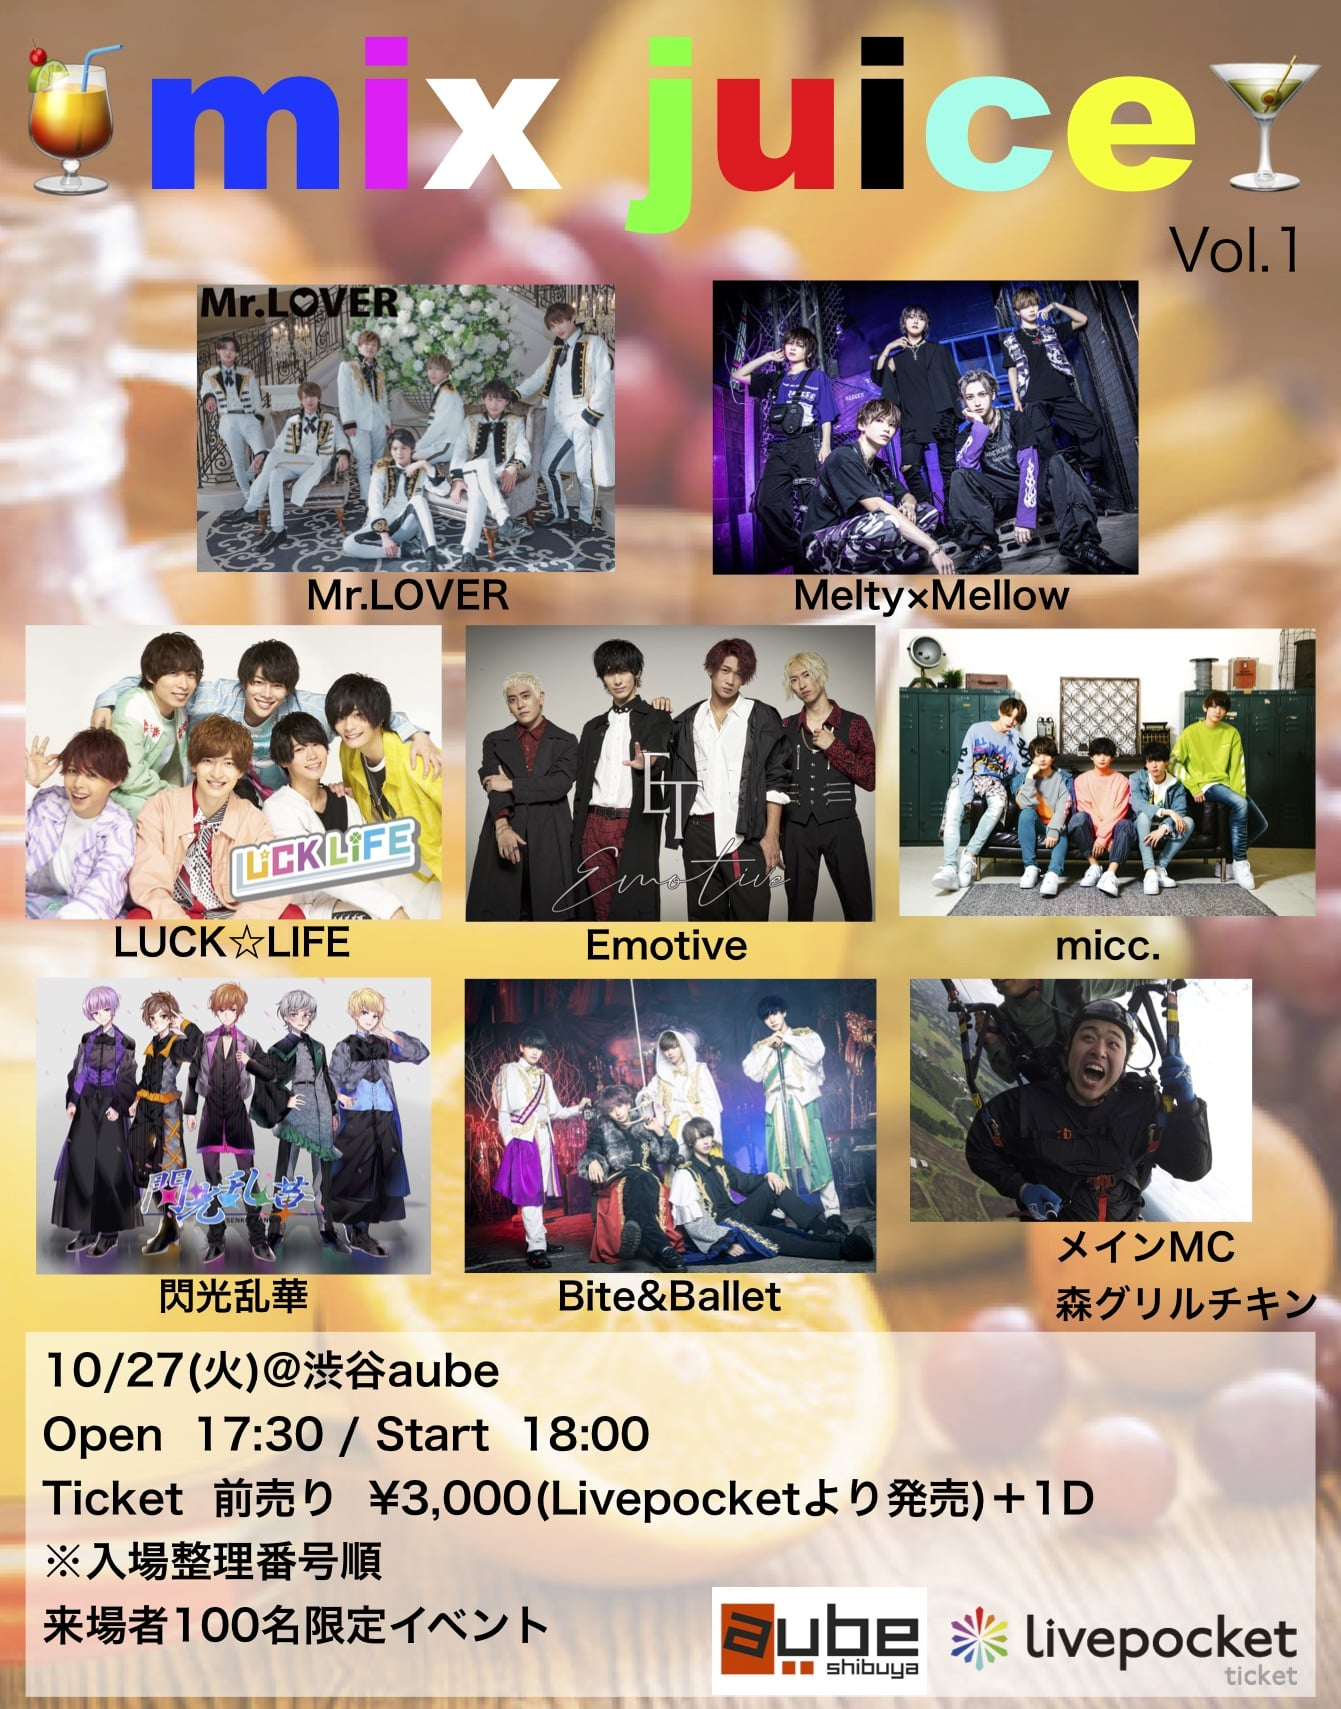 「mix juice」vol.1